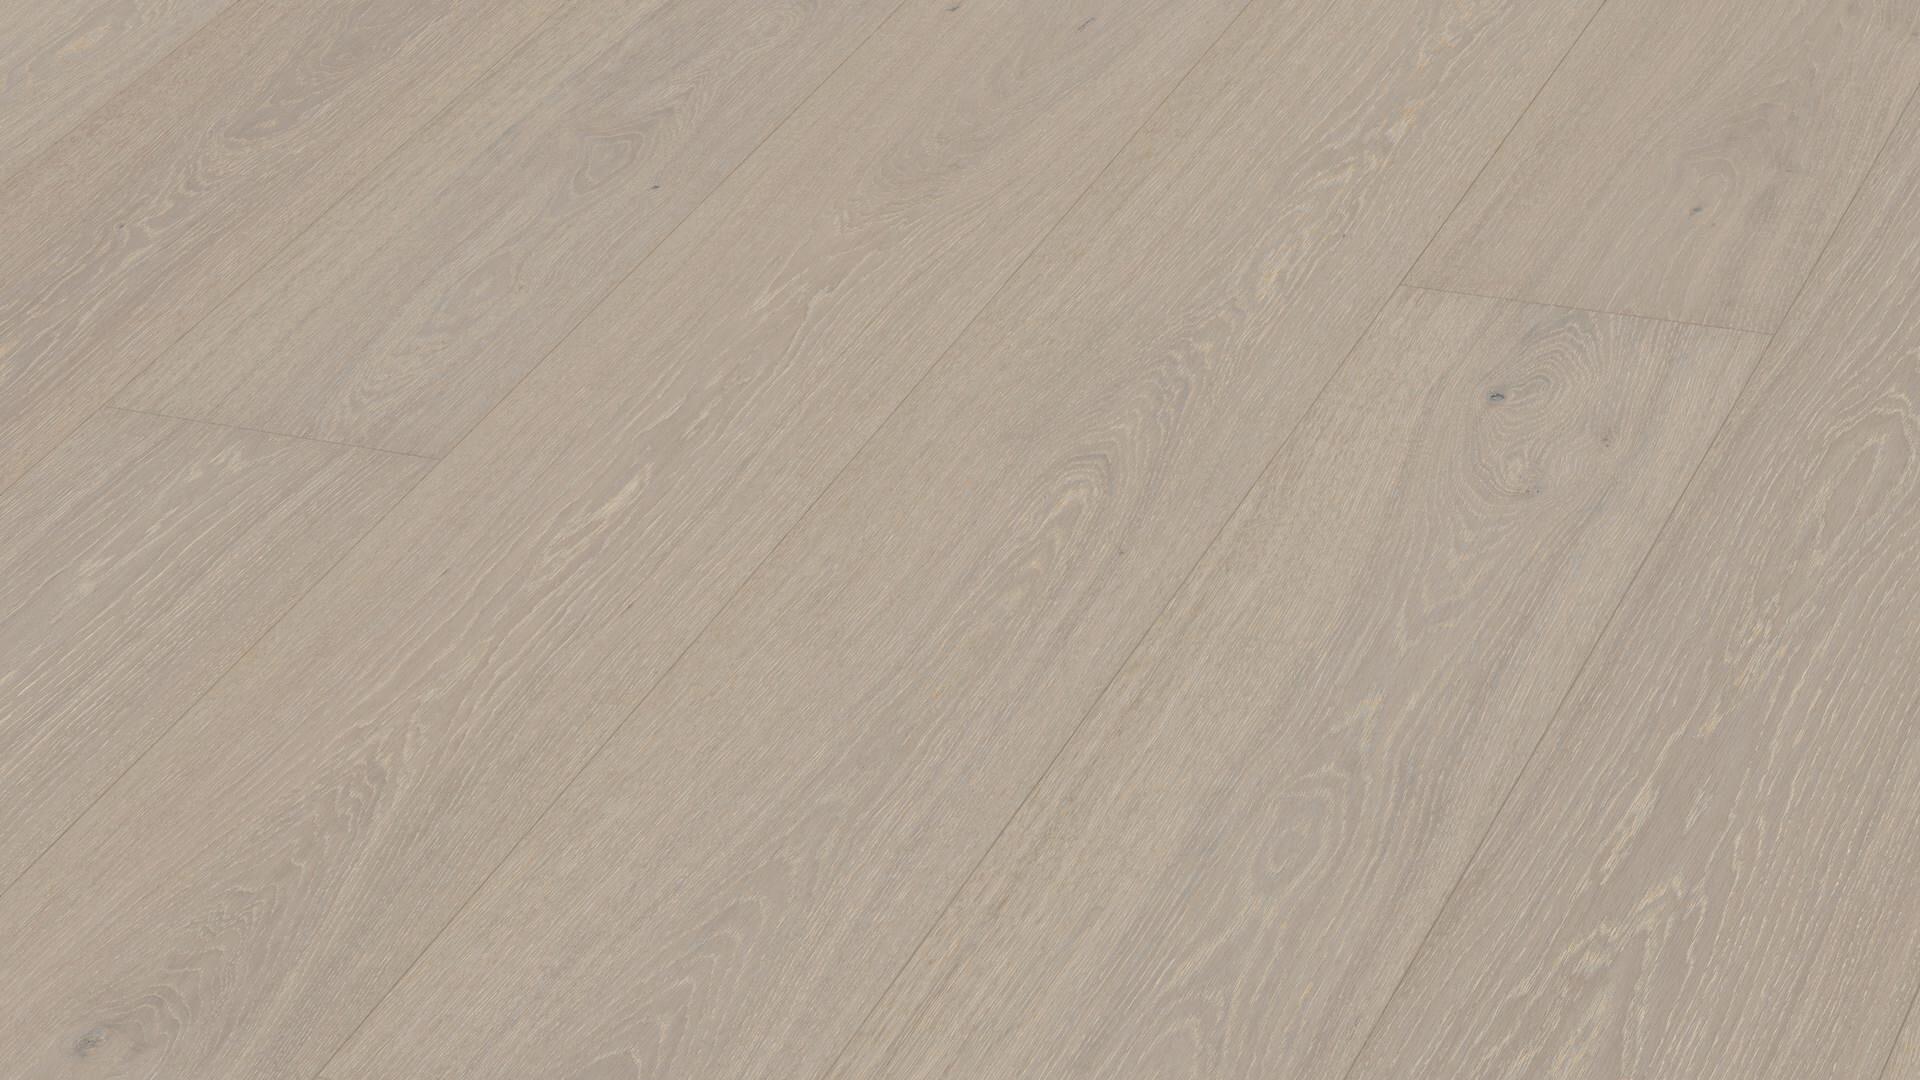 Parkett MeisterParkett. longlife PD 450 Eiche harmonisch grauweiß 8774